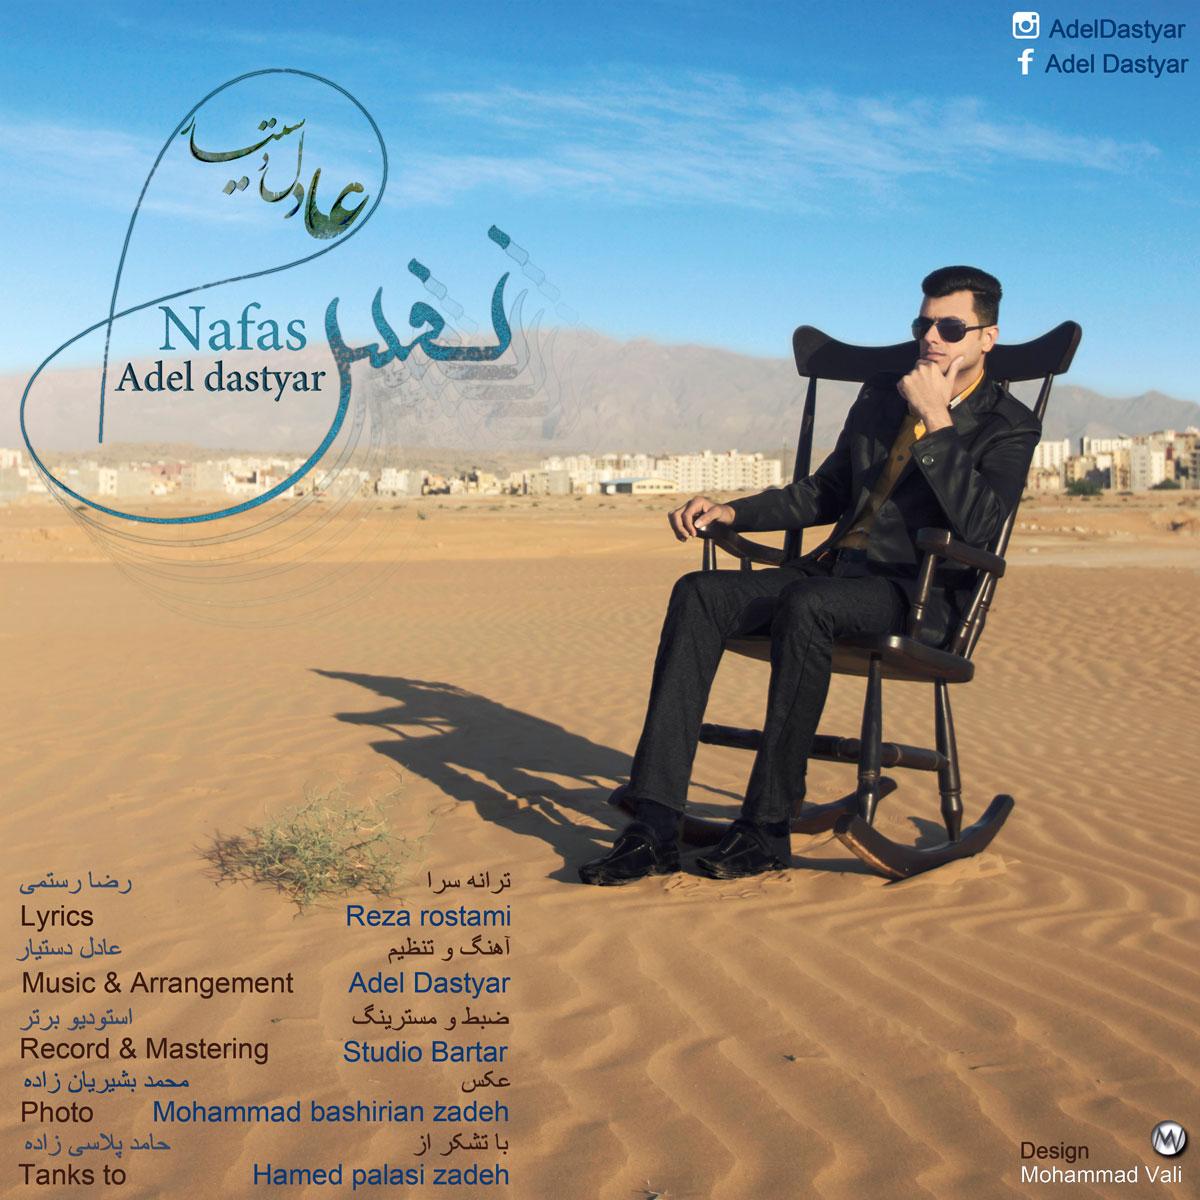 Adel Dastyar – Nafas